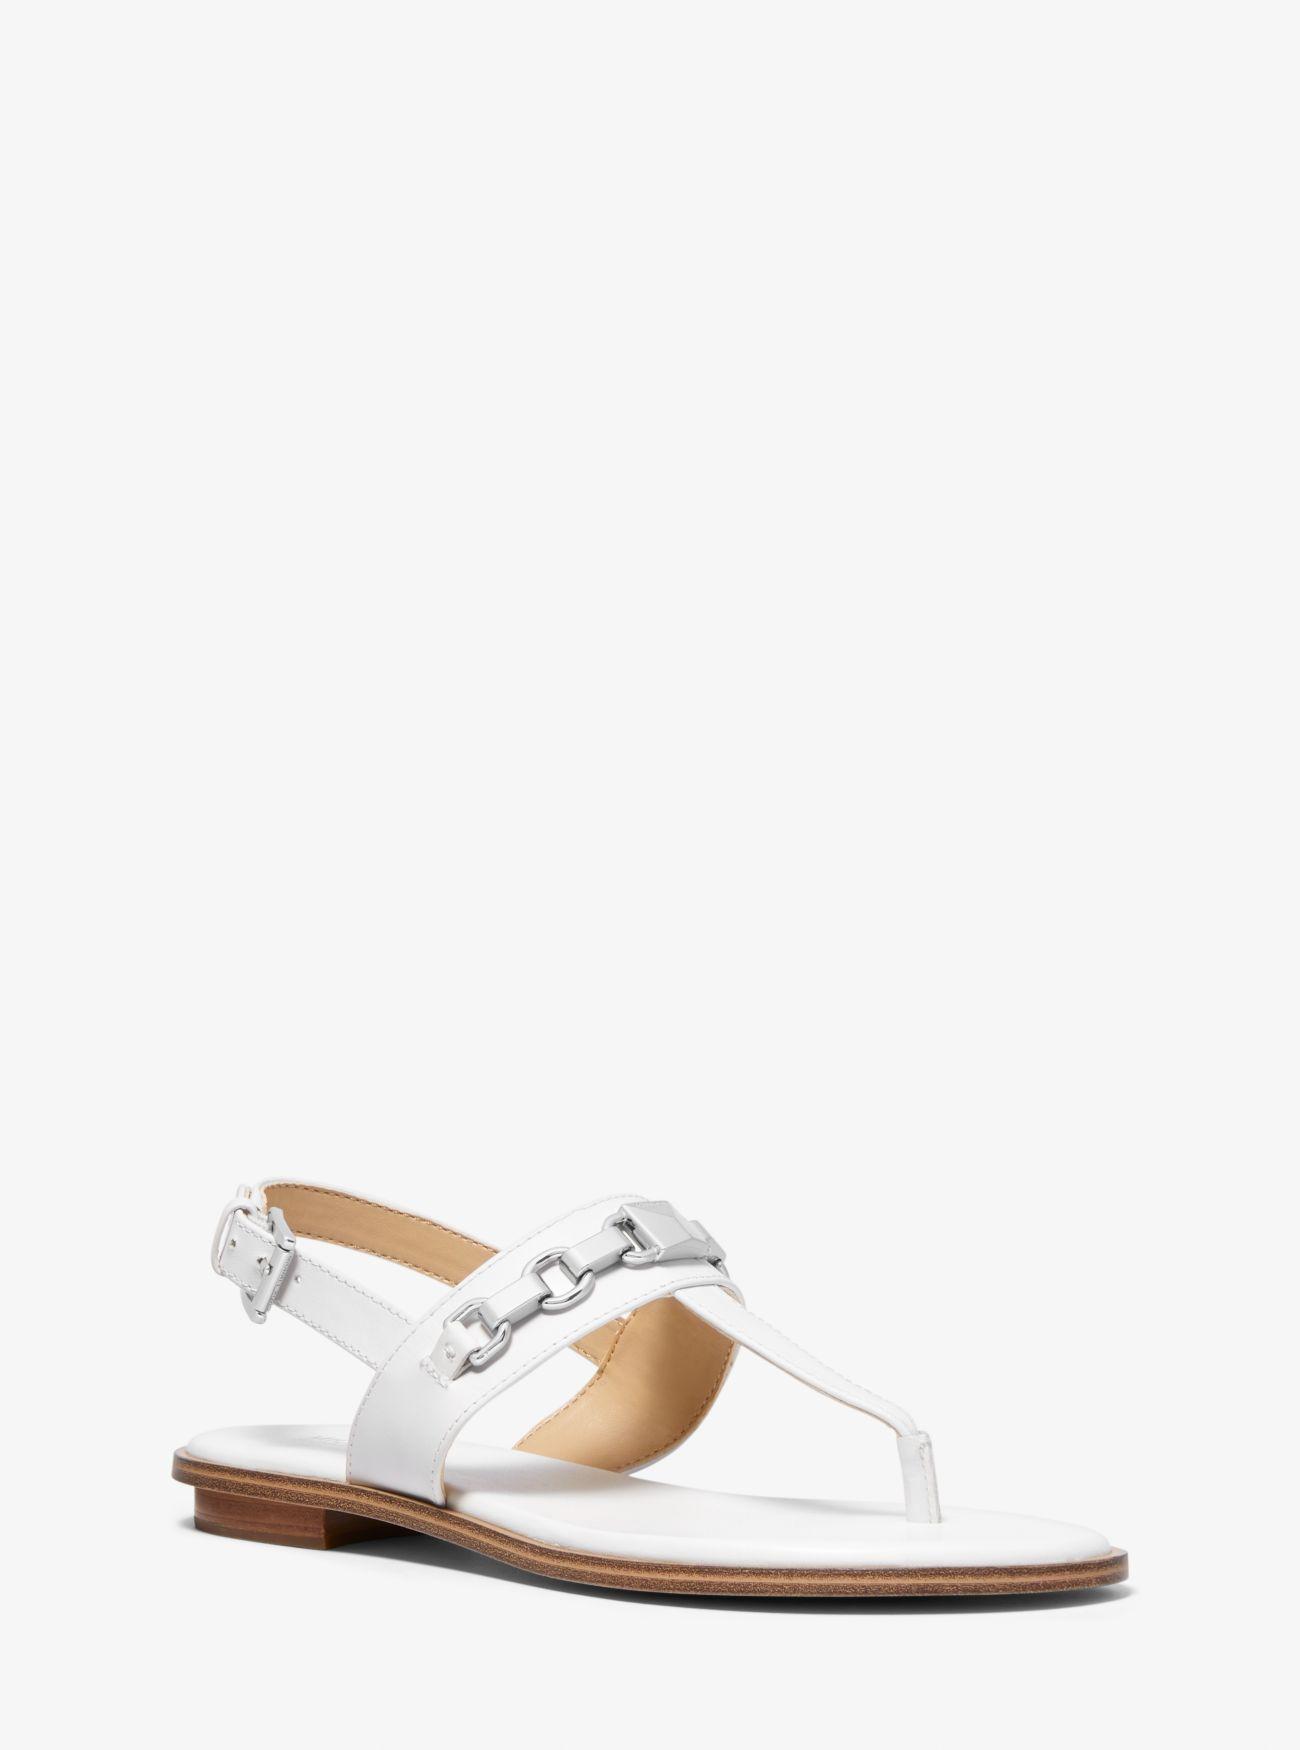 ba99cbb091f Lyst - MICHAEL Michael Kors Charlton Leather Sandal in White